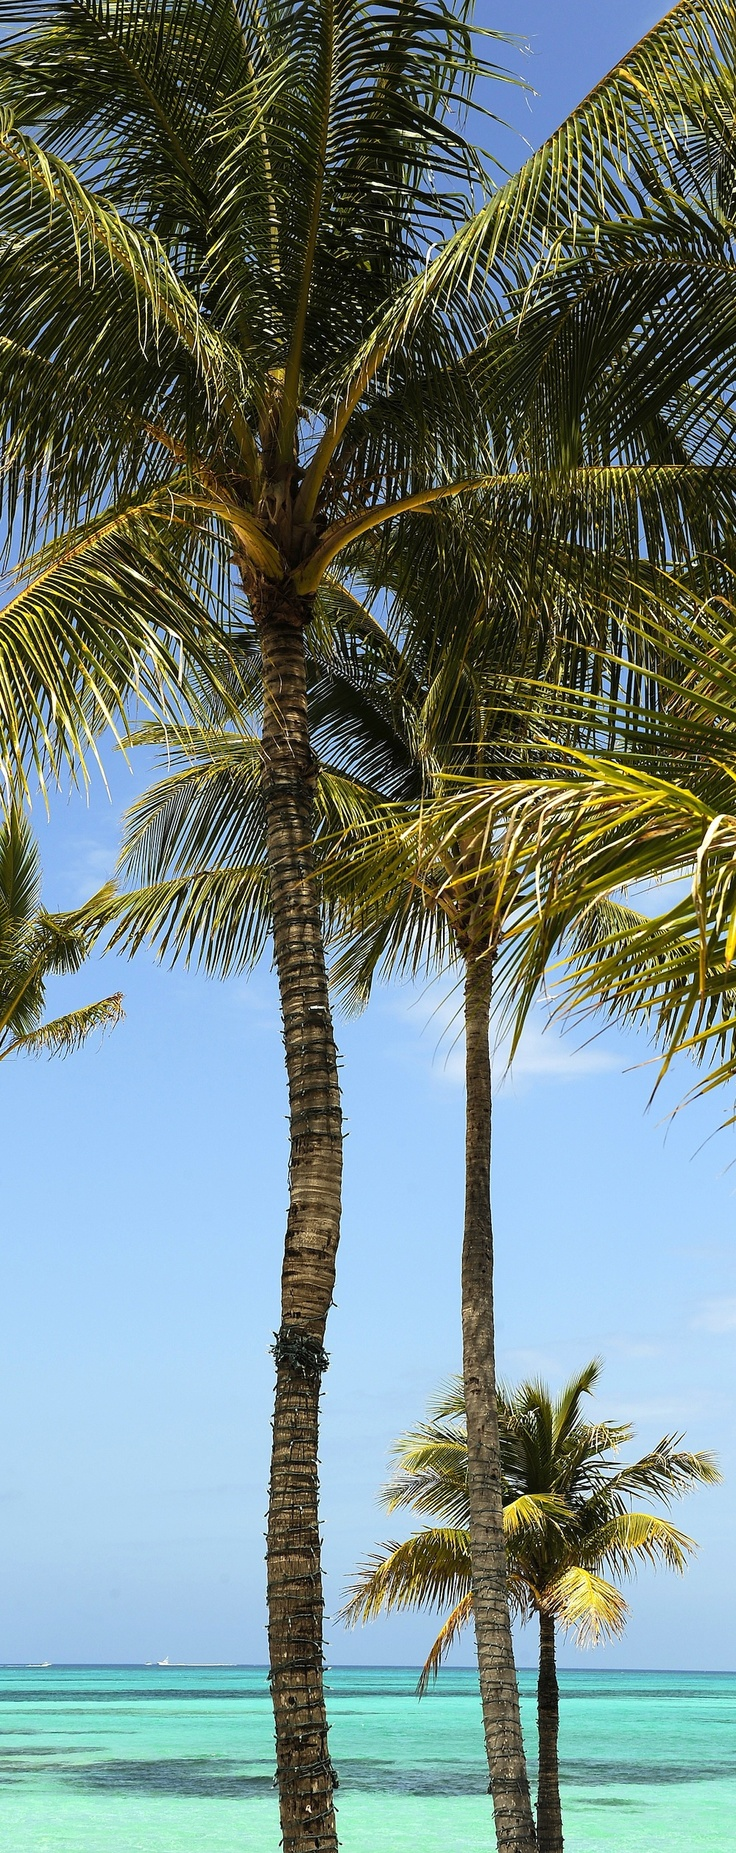 Catch some shade on the beach in Nassau Paradise Island, The Bahamas, Caribbean